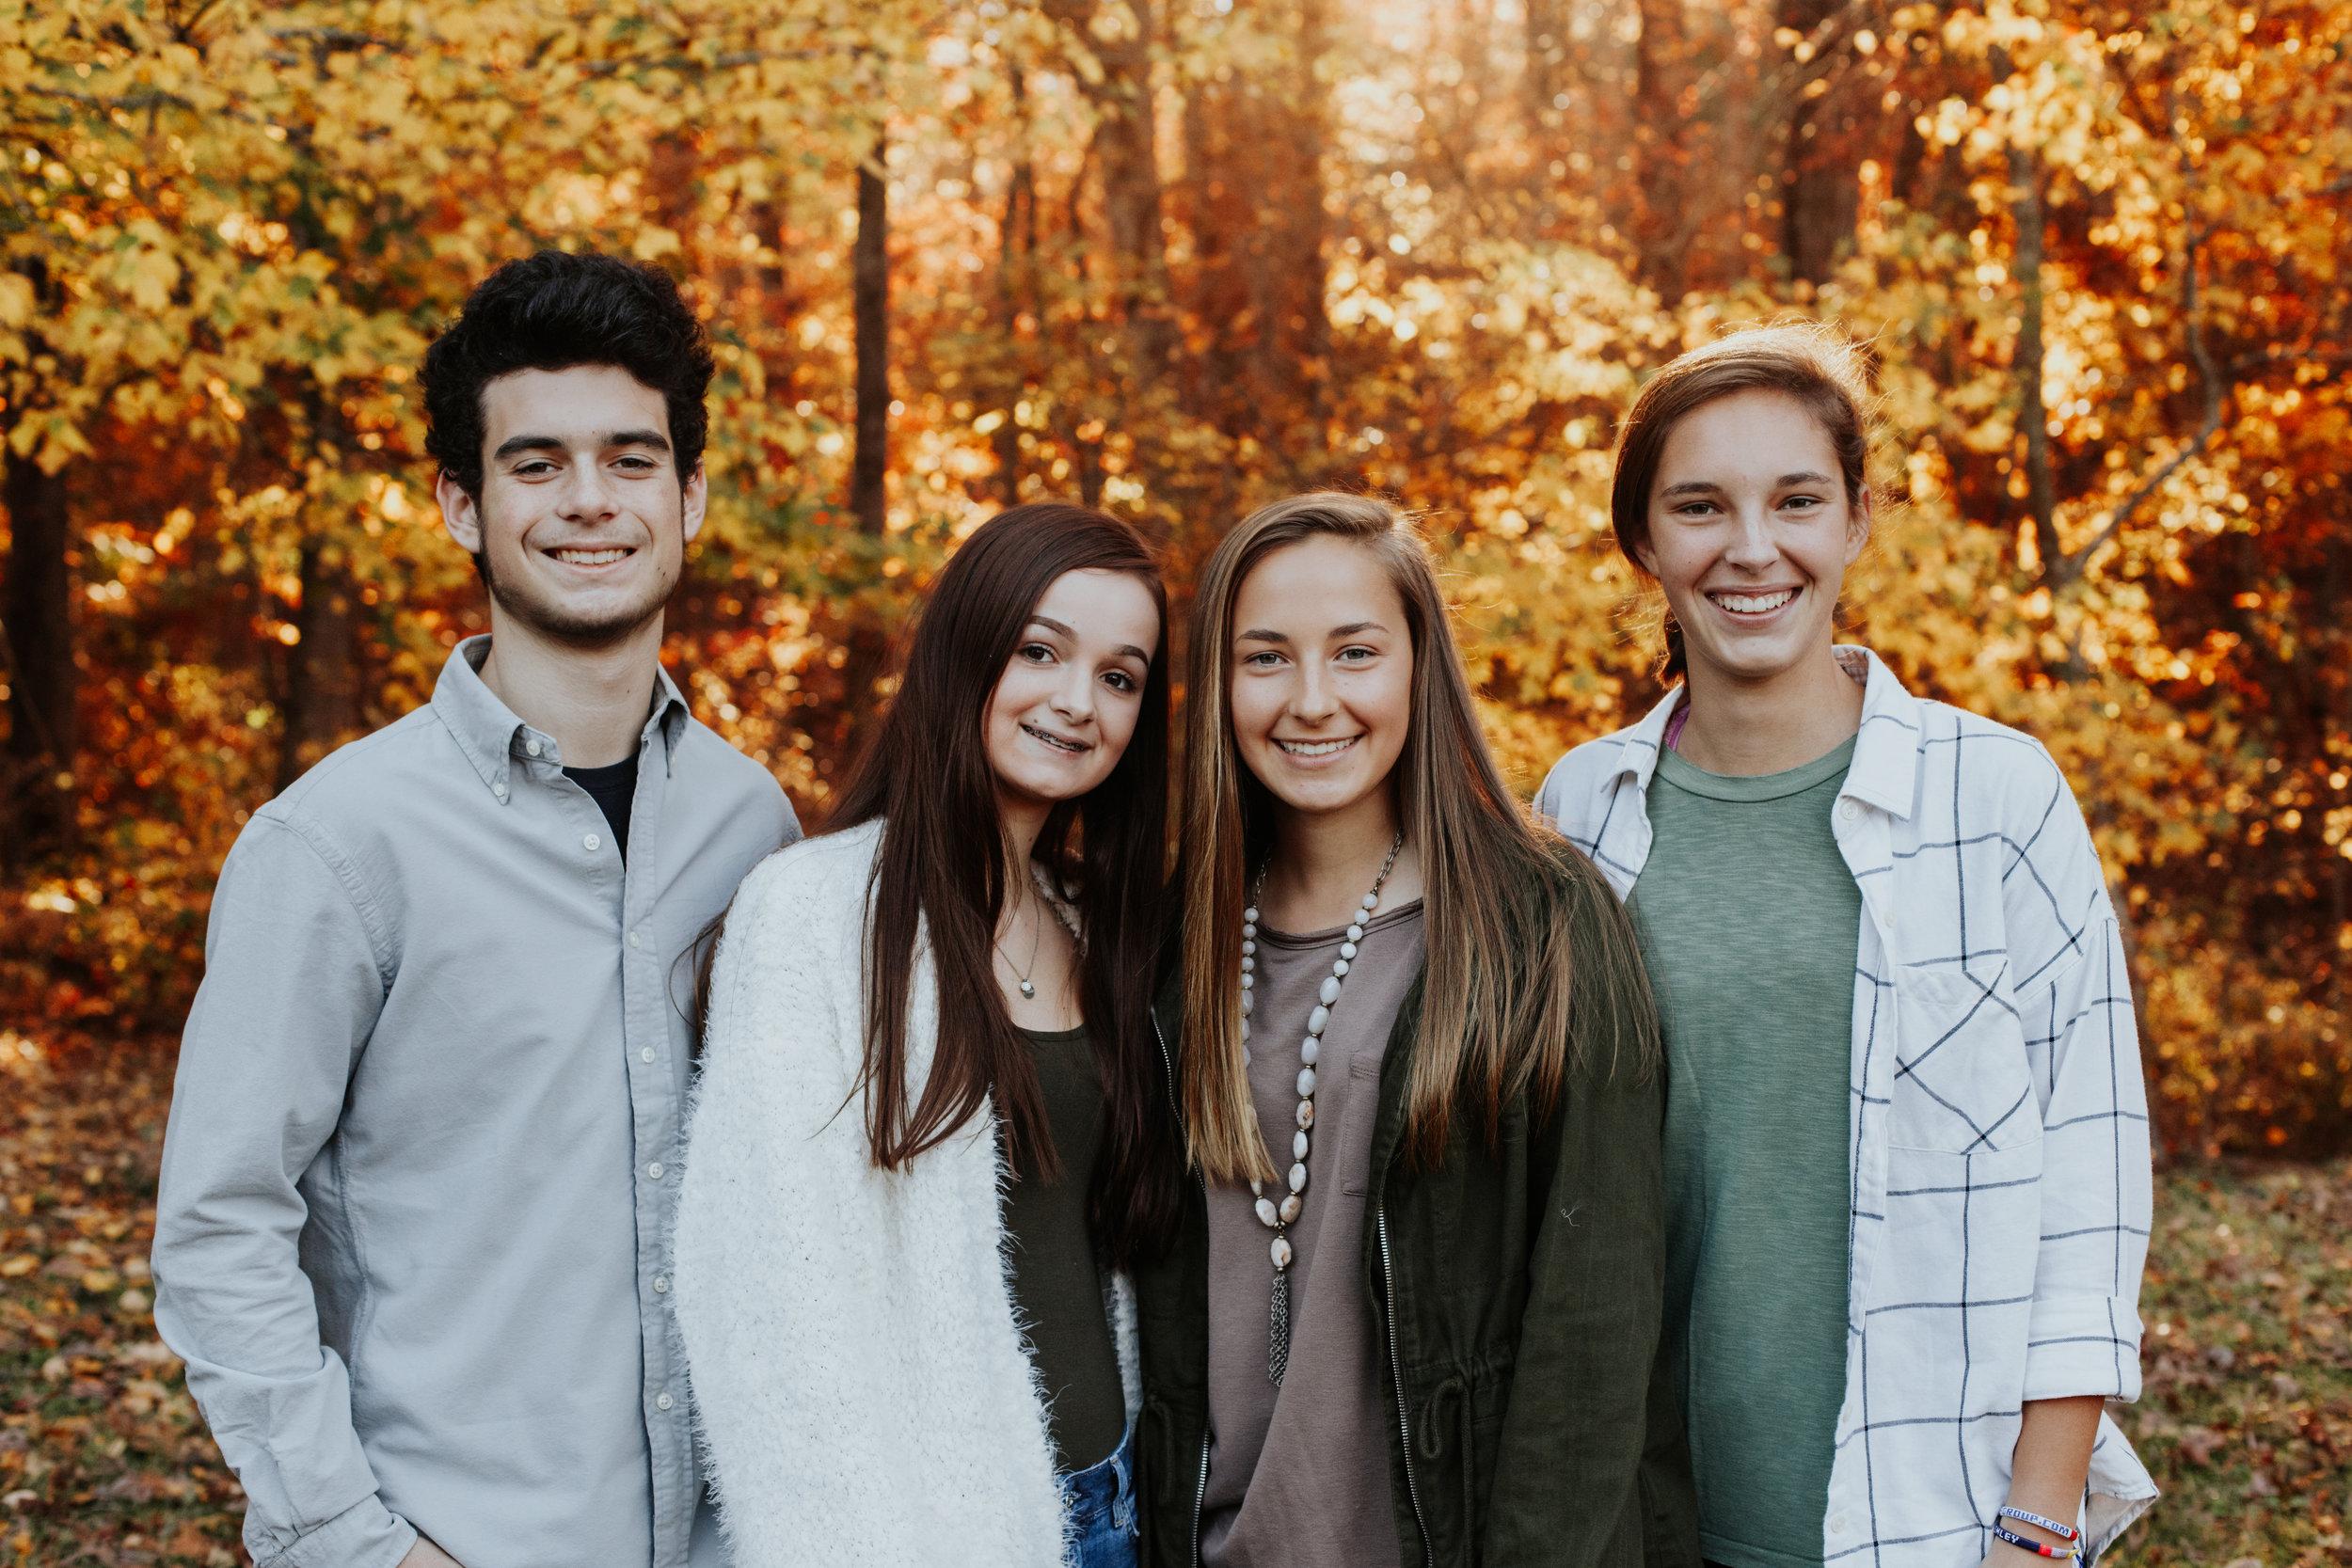 thedavisfamily-23.jpg